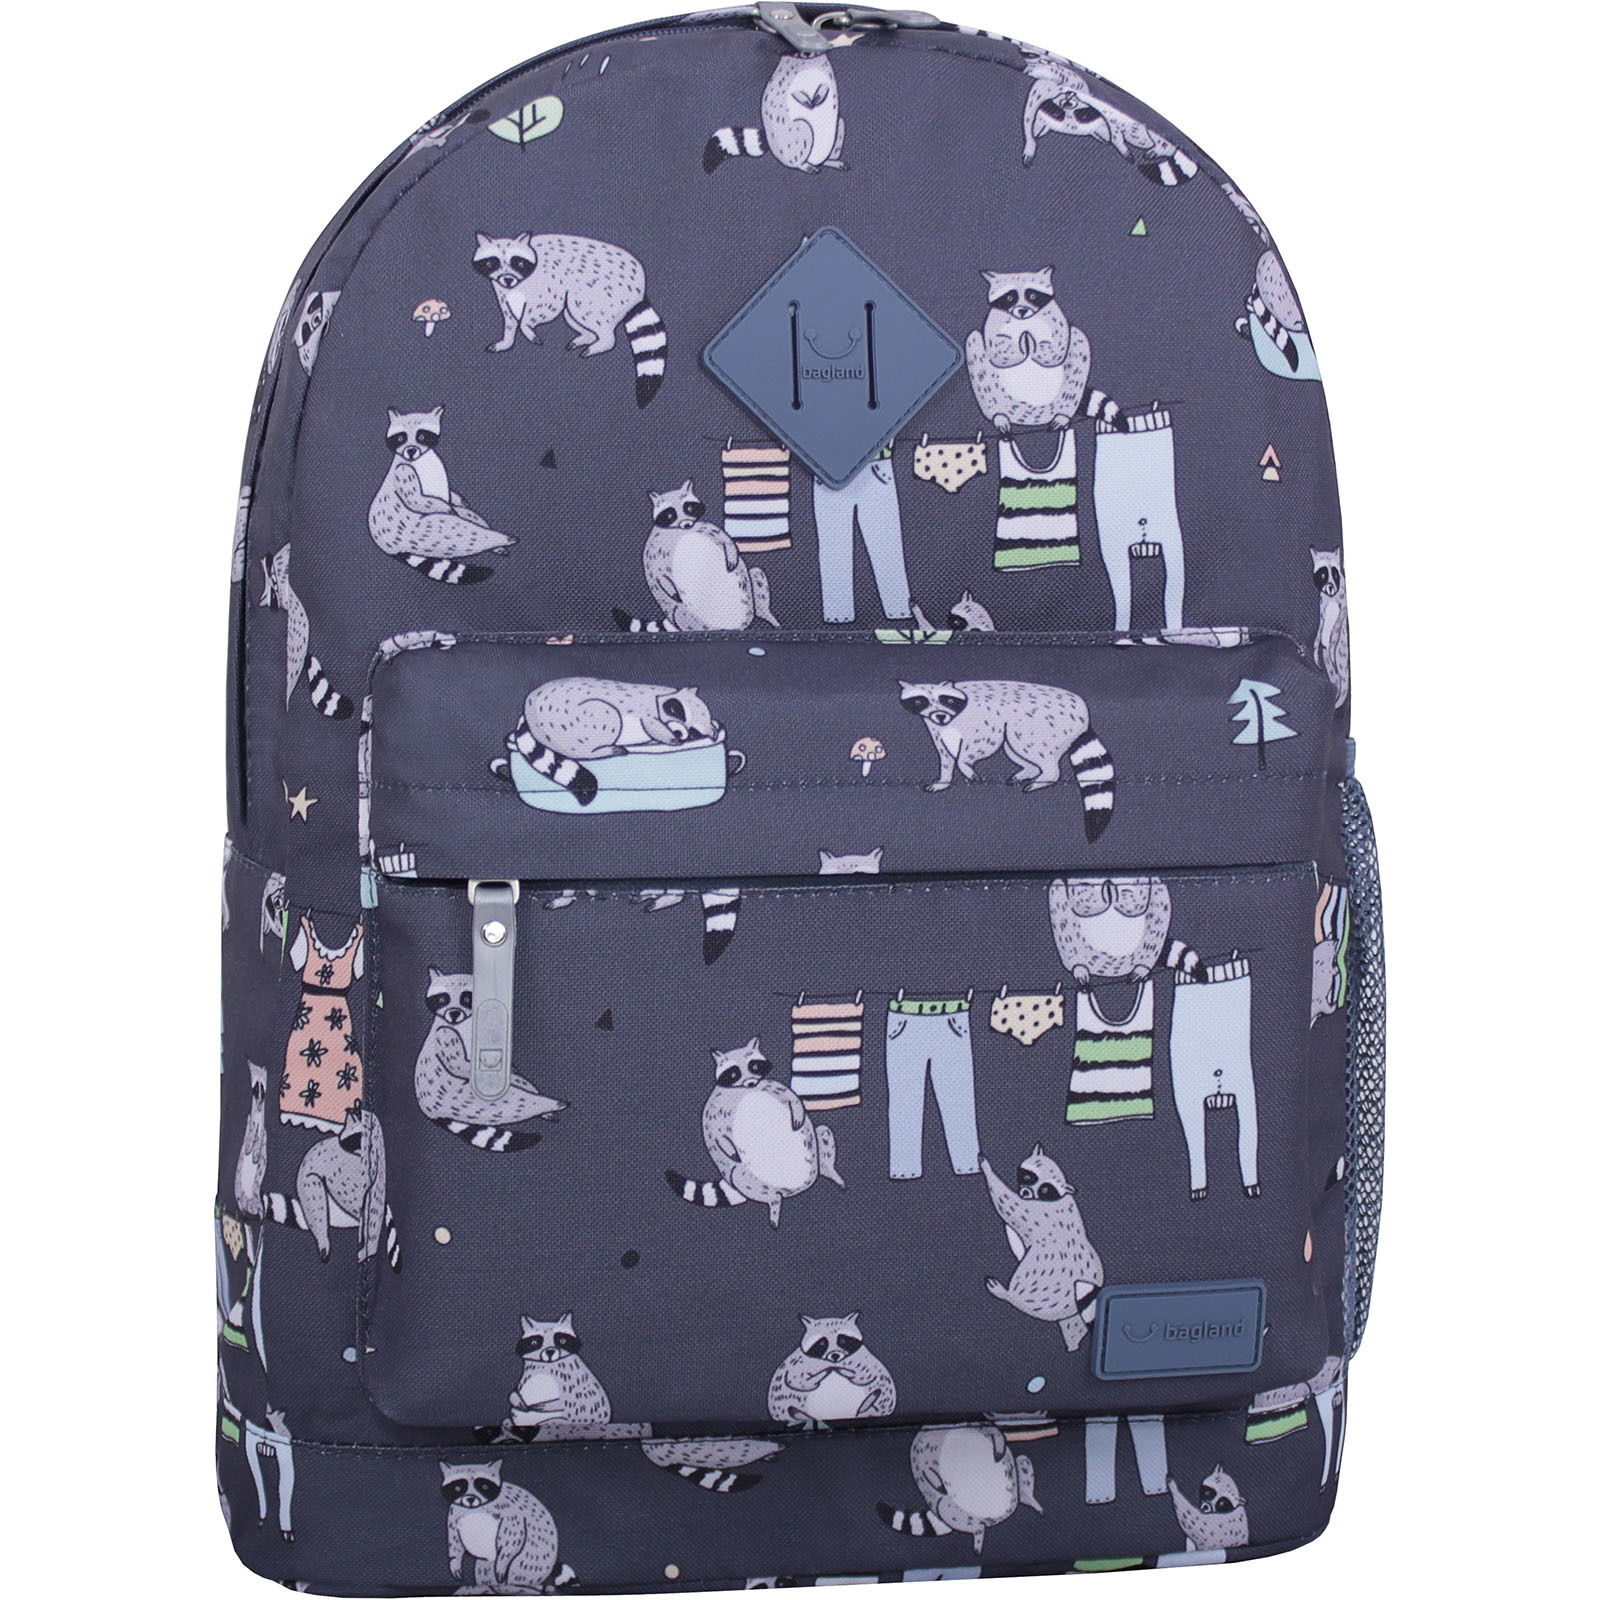 Городские рюкзаки Рюкзак Bagland Молодежный (дизайн) 17 л. сублімація 220 (00533664) IMG_2705_суб.220_.JPG